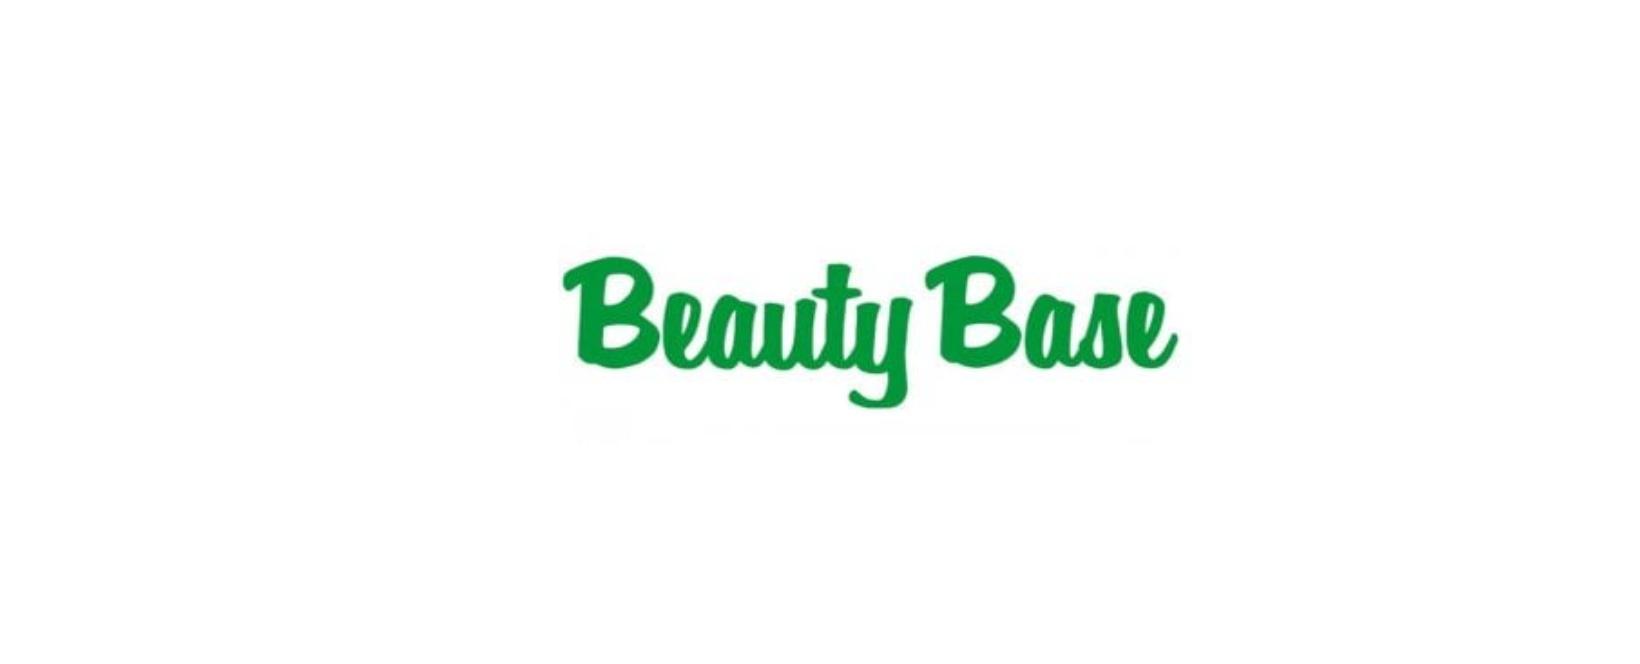 Beauty Base UK Discount Code 2021